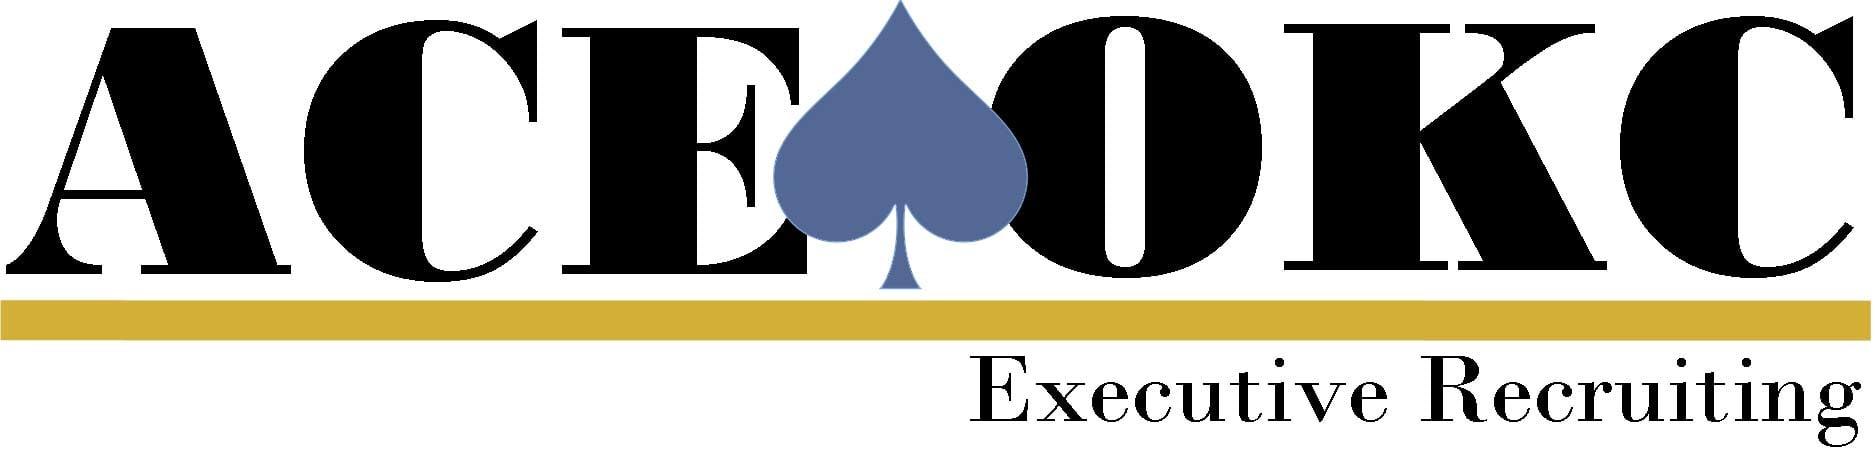 ACE-OKC-LOGO